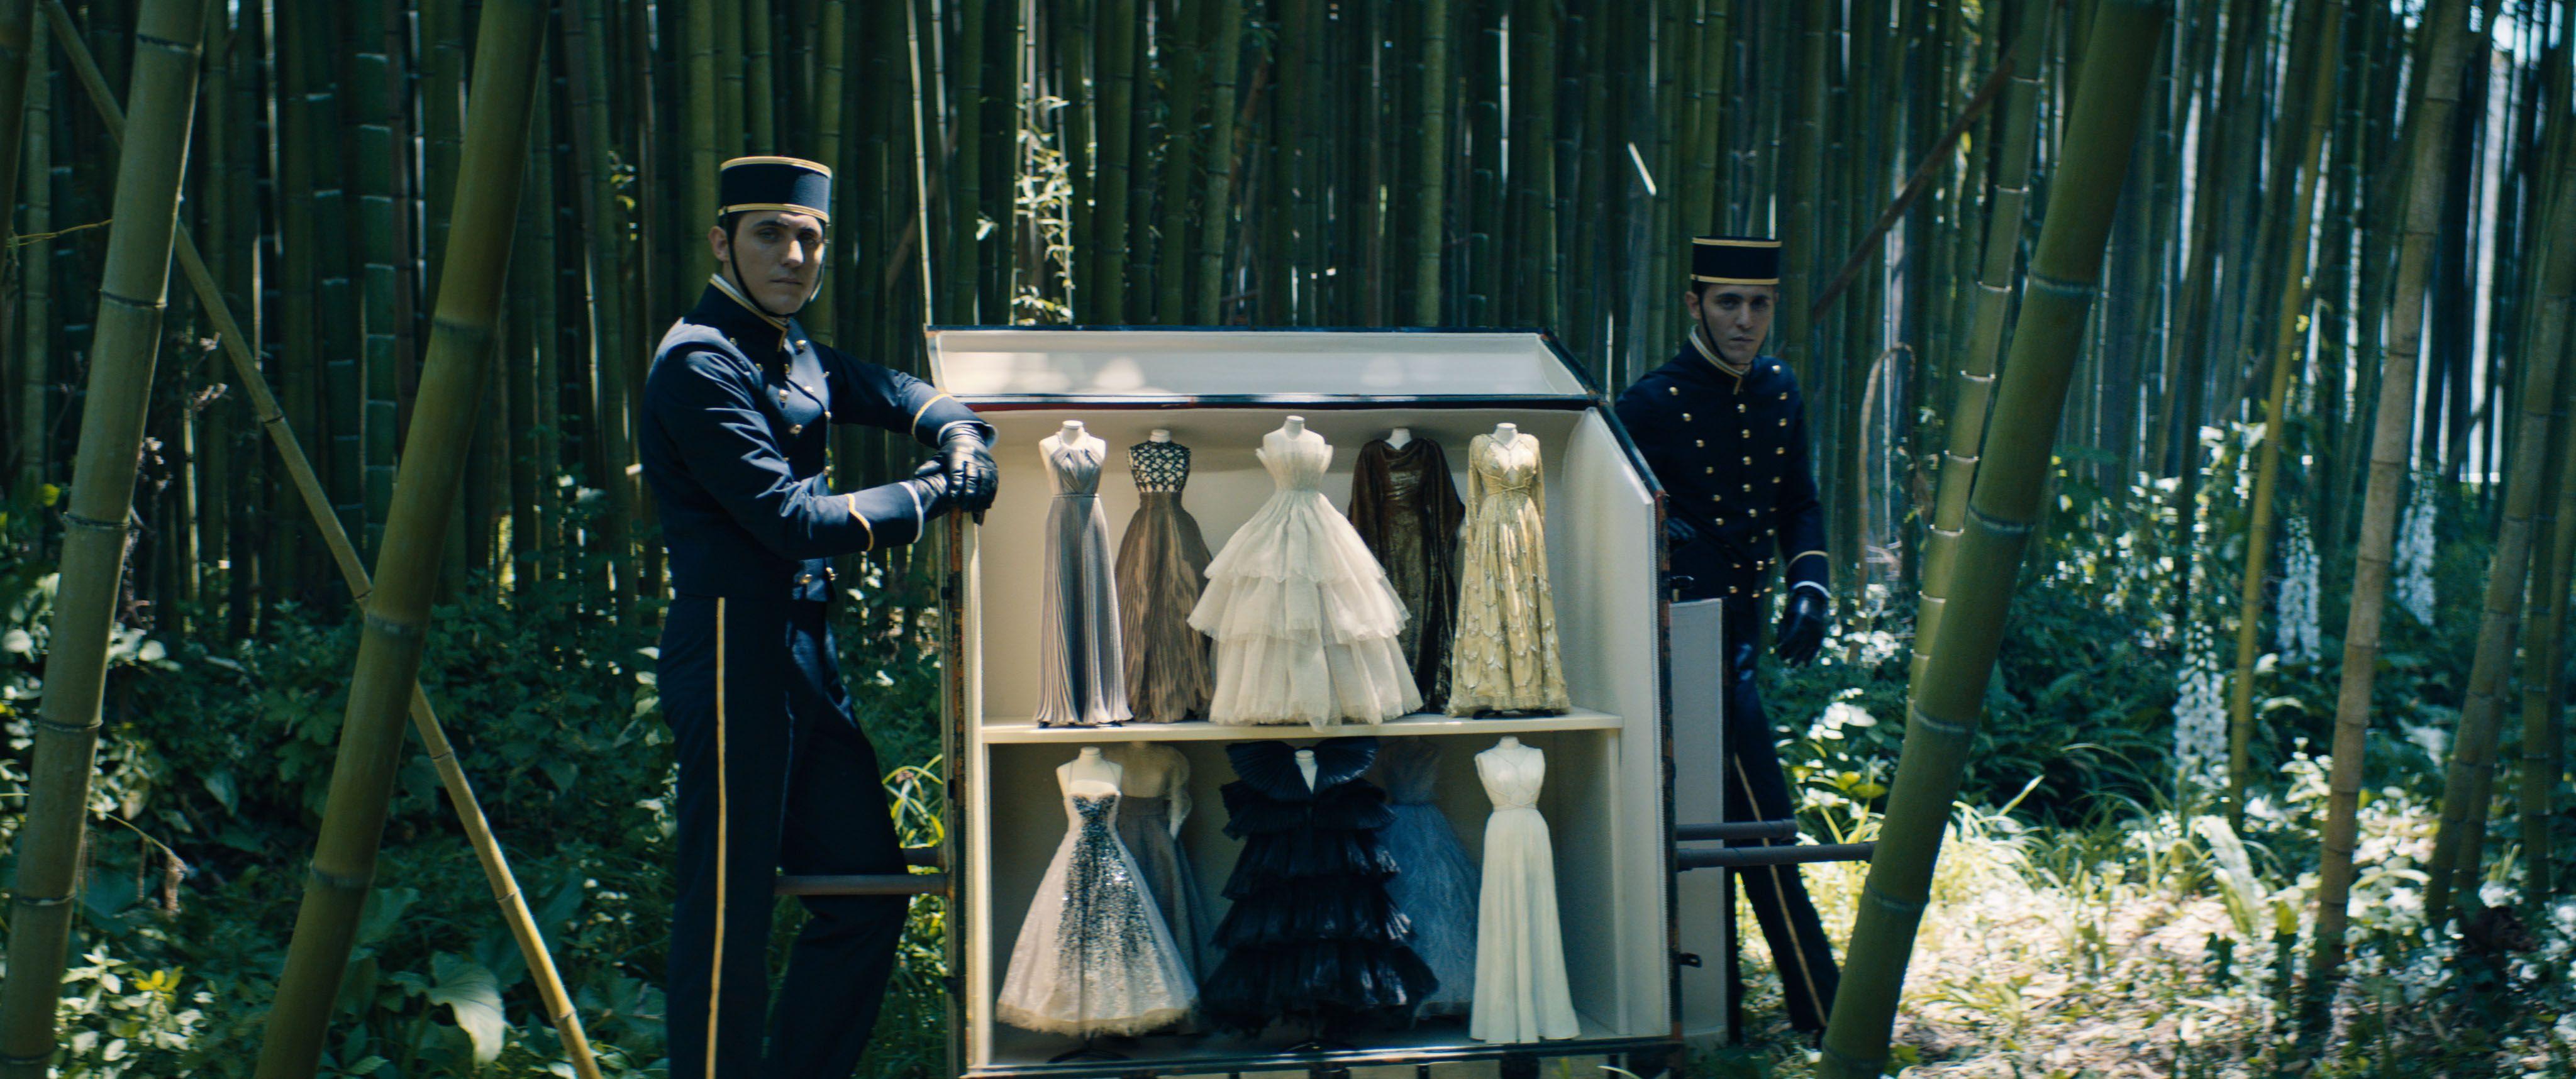 Dior's haute couture autumn winter line in miniature